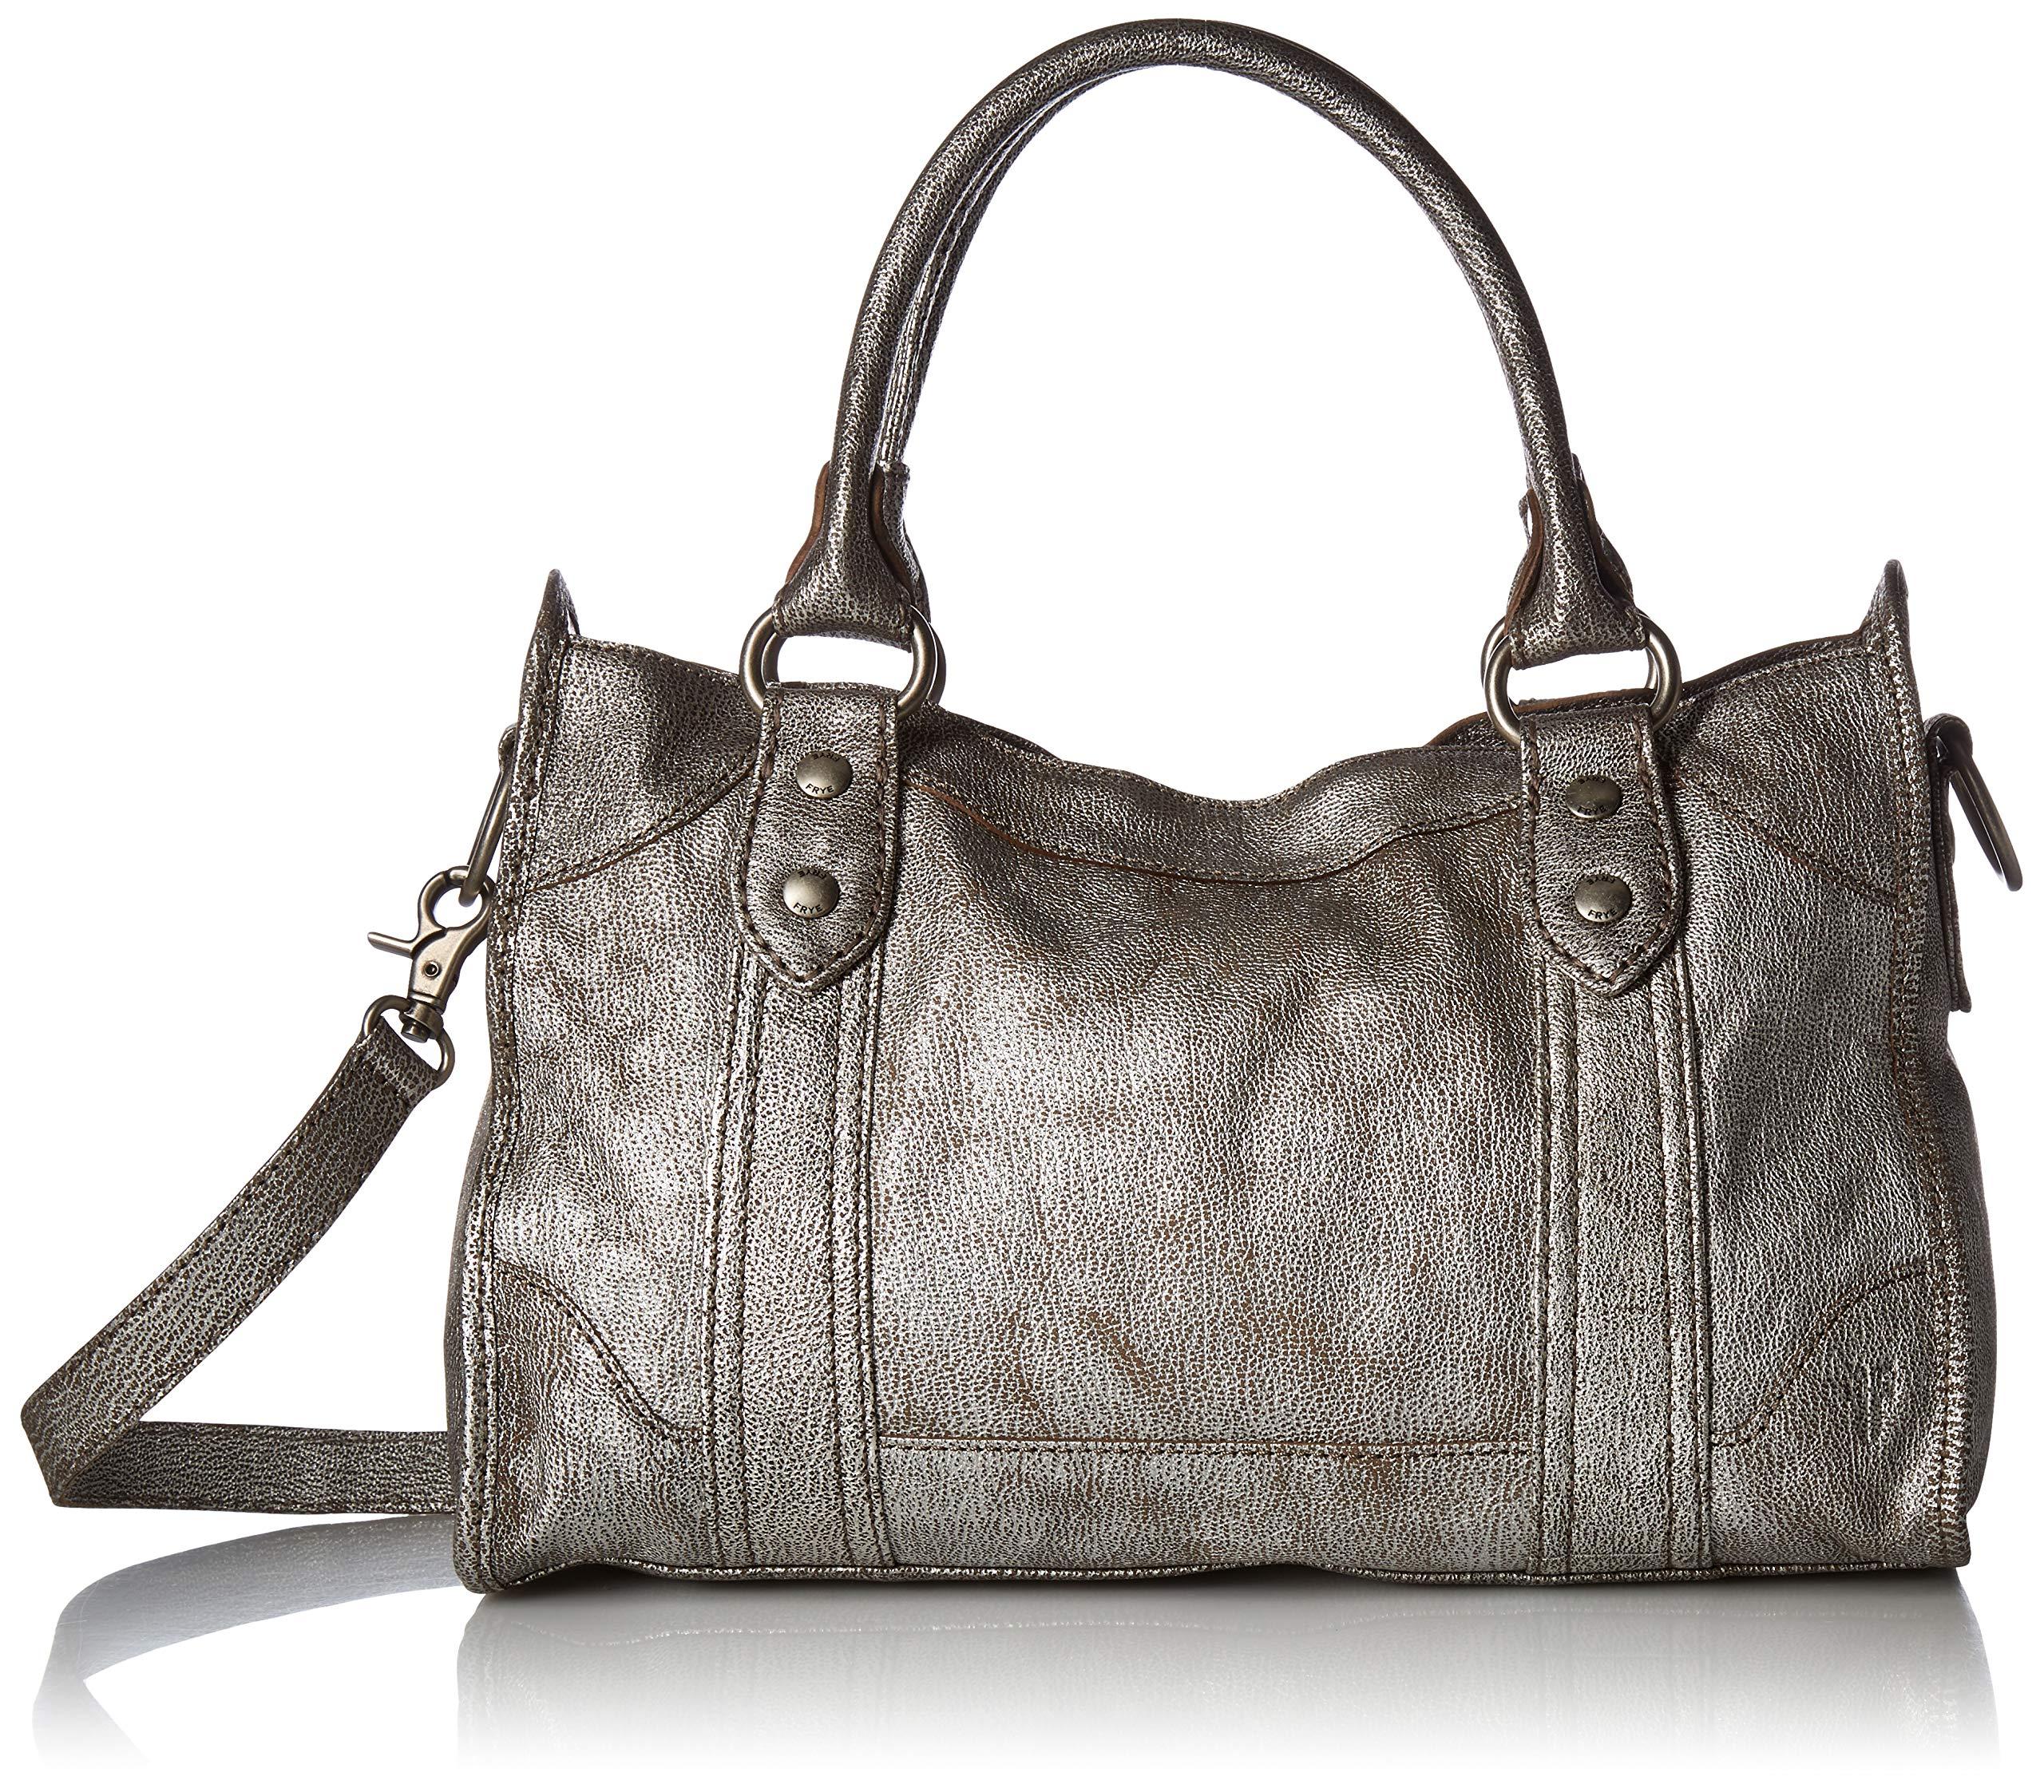 Frye Melissa Zip Satchel Leather Handbag, Silver by FRYE